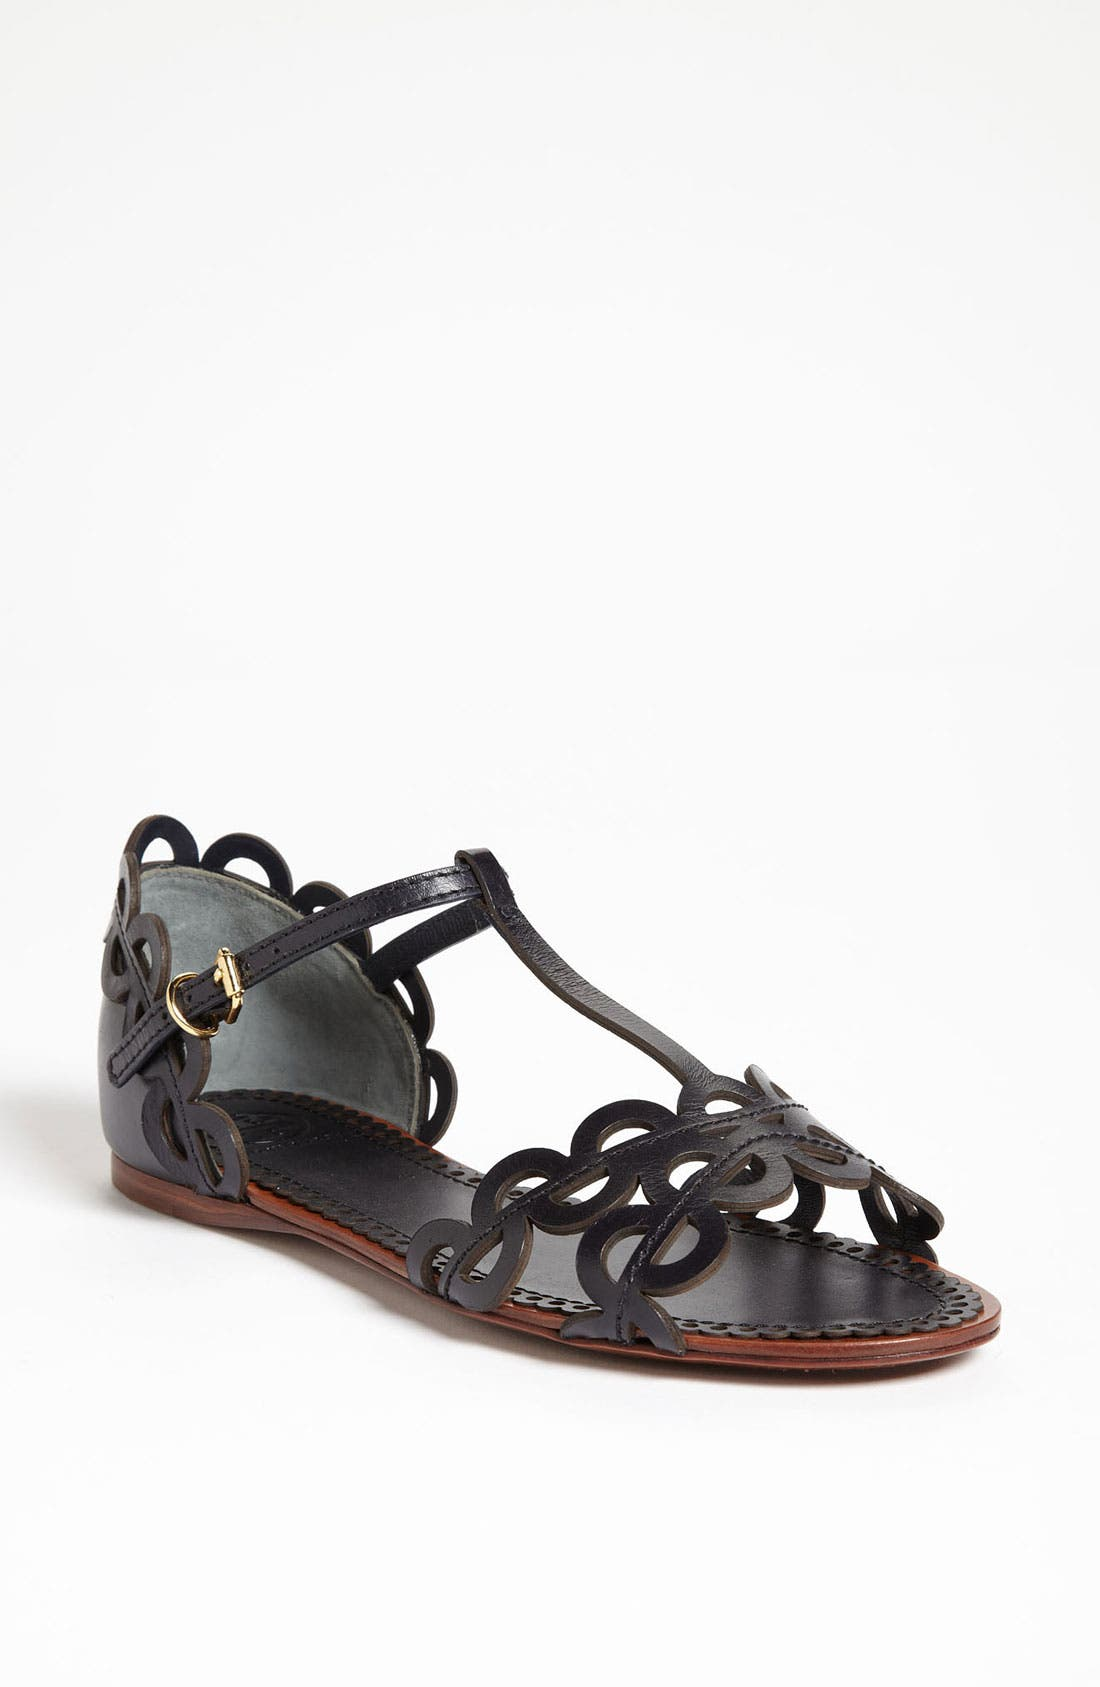 Alternate Image 1 Selected - Tory Burch 'Aileen' Flat Sandal